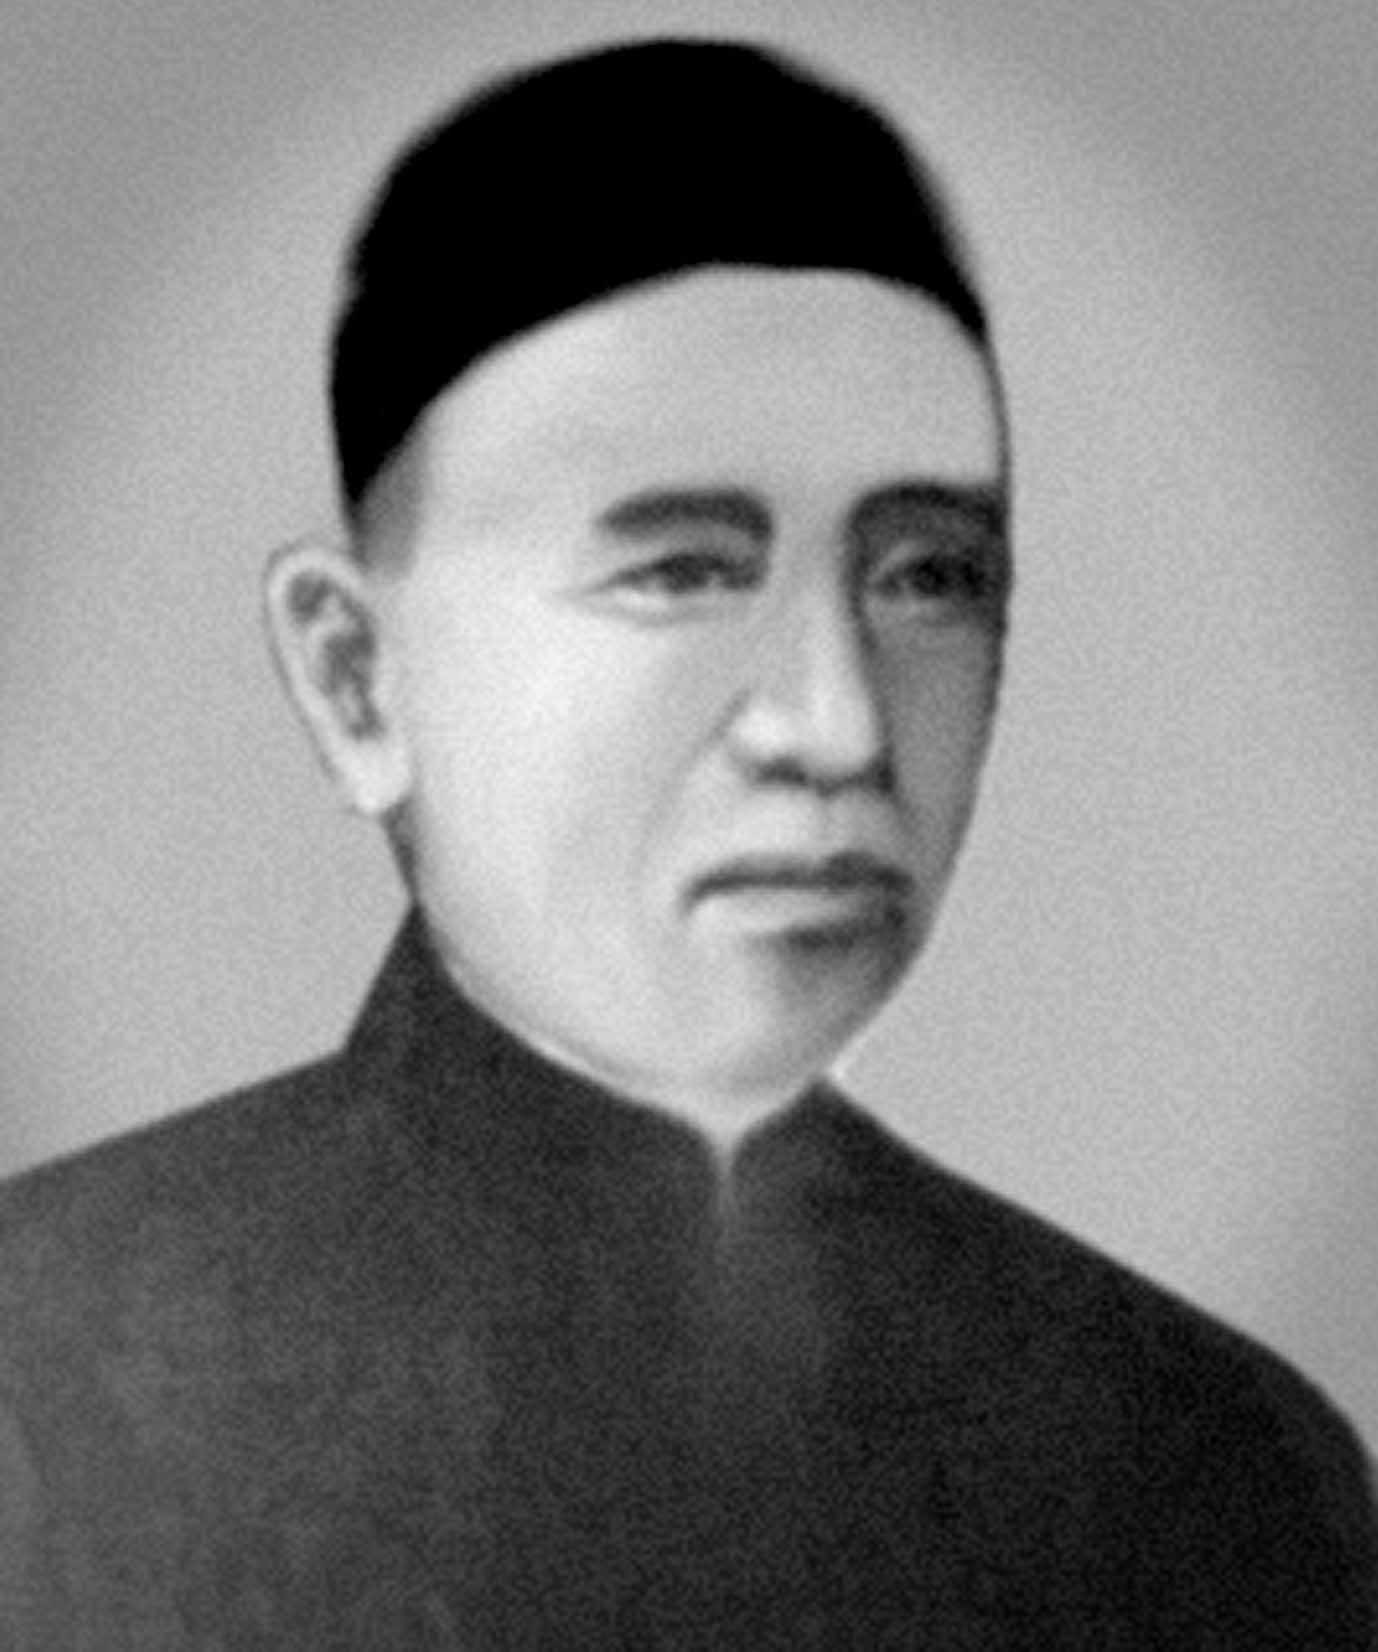 Chan On-Bak, Choy Li Fut